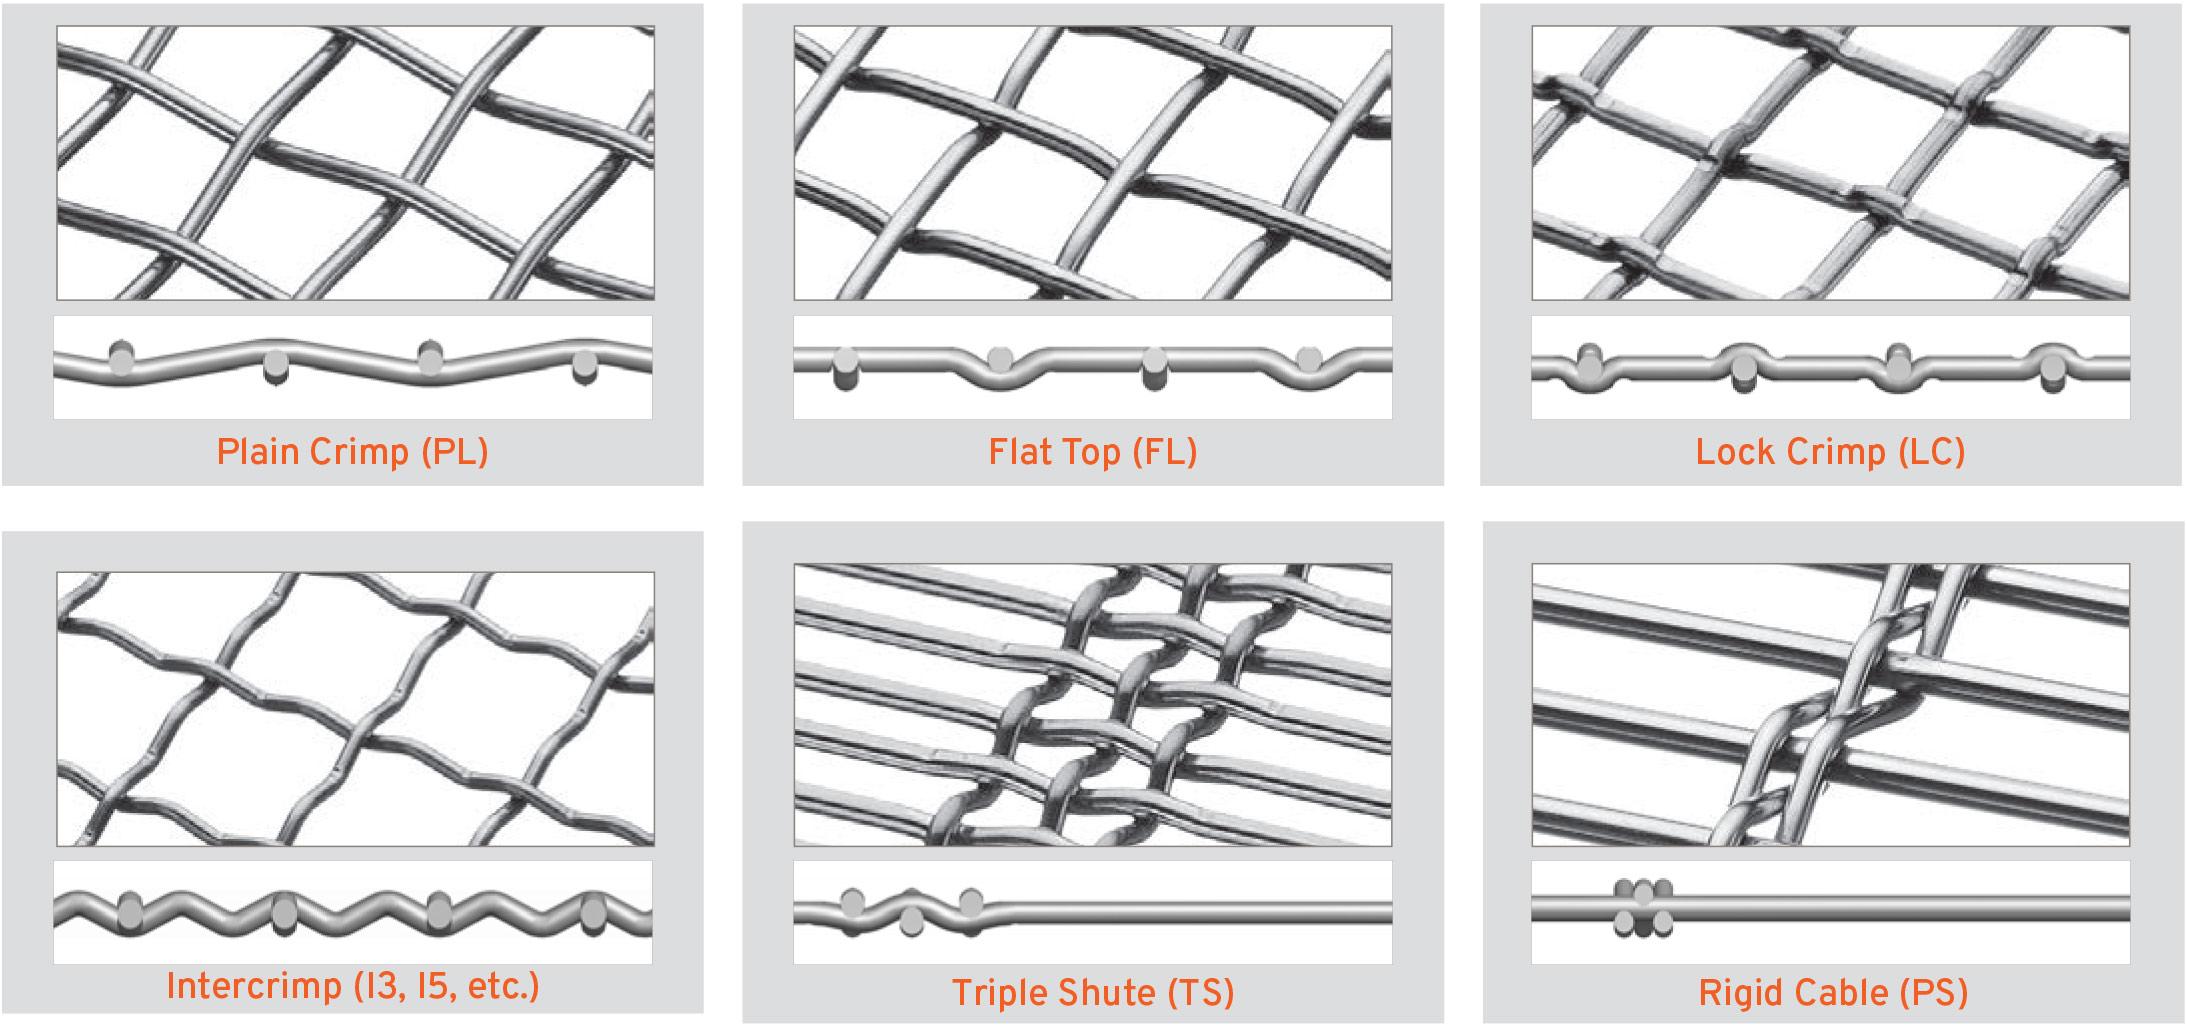 a breakdown of woven wire relationships